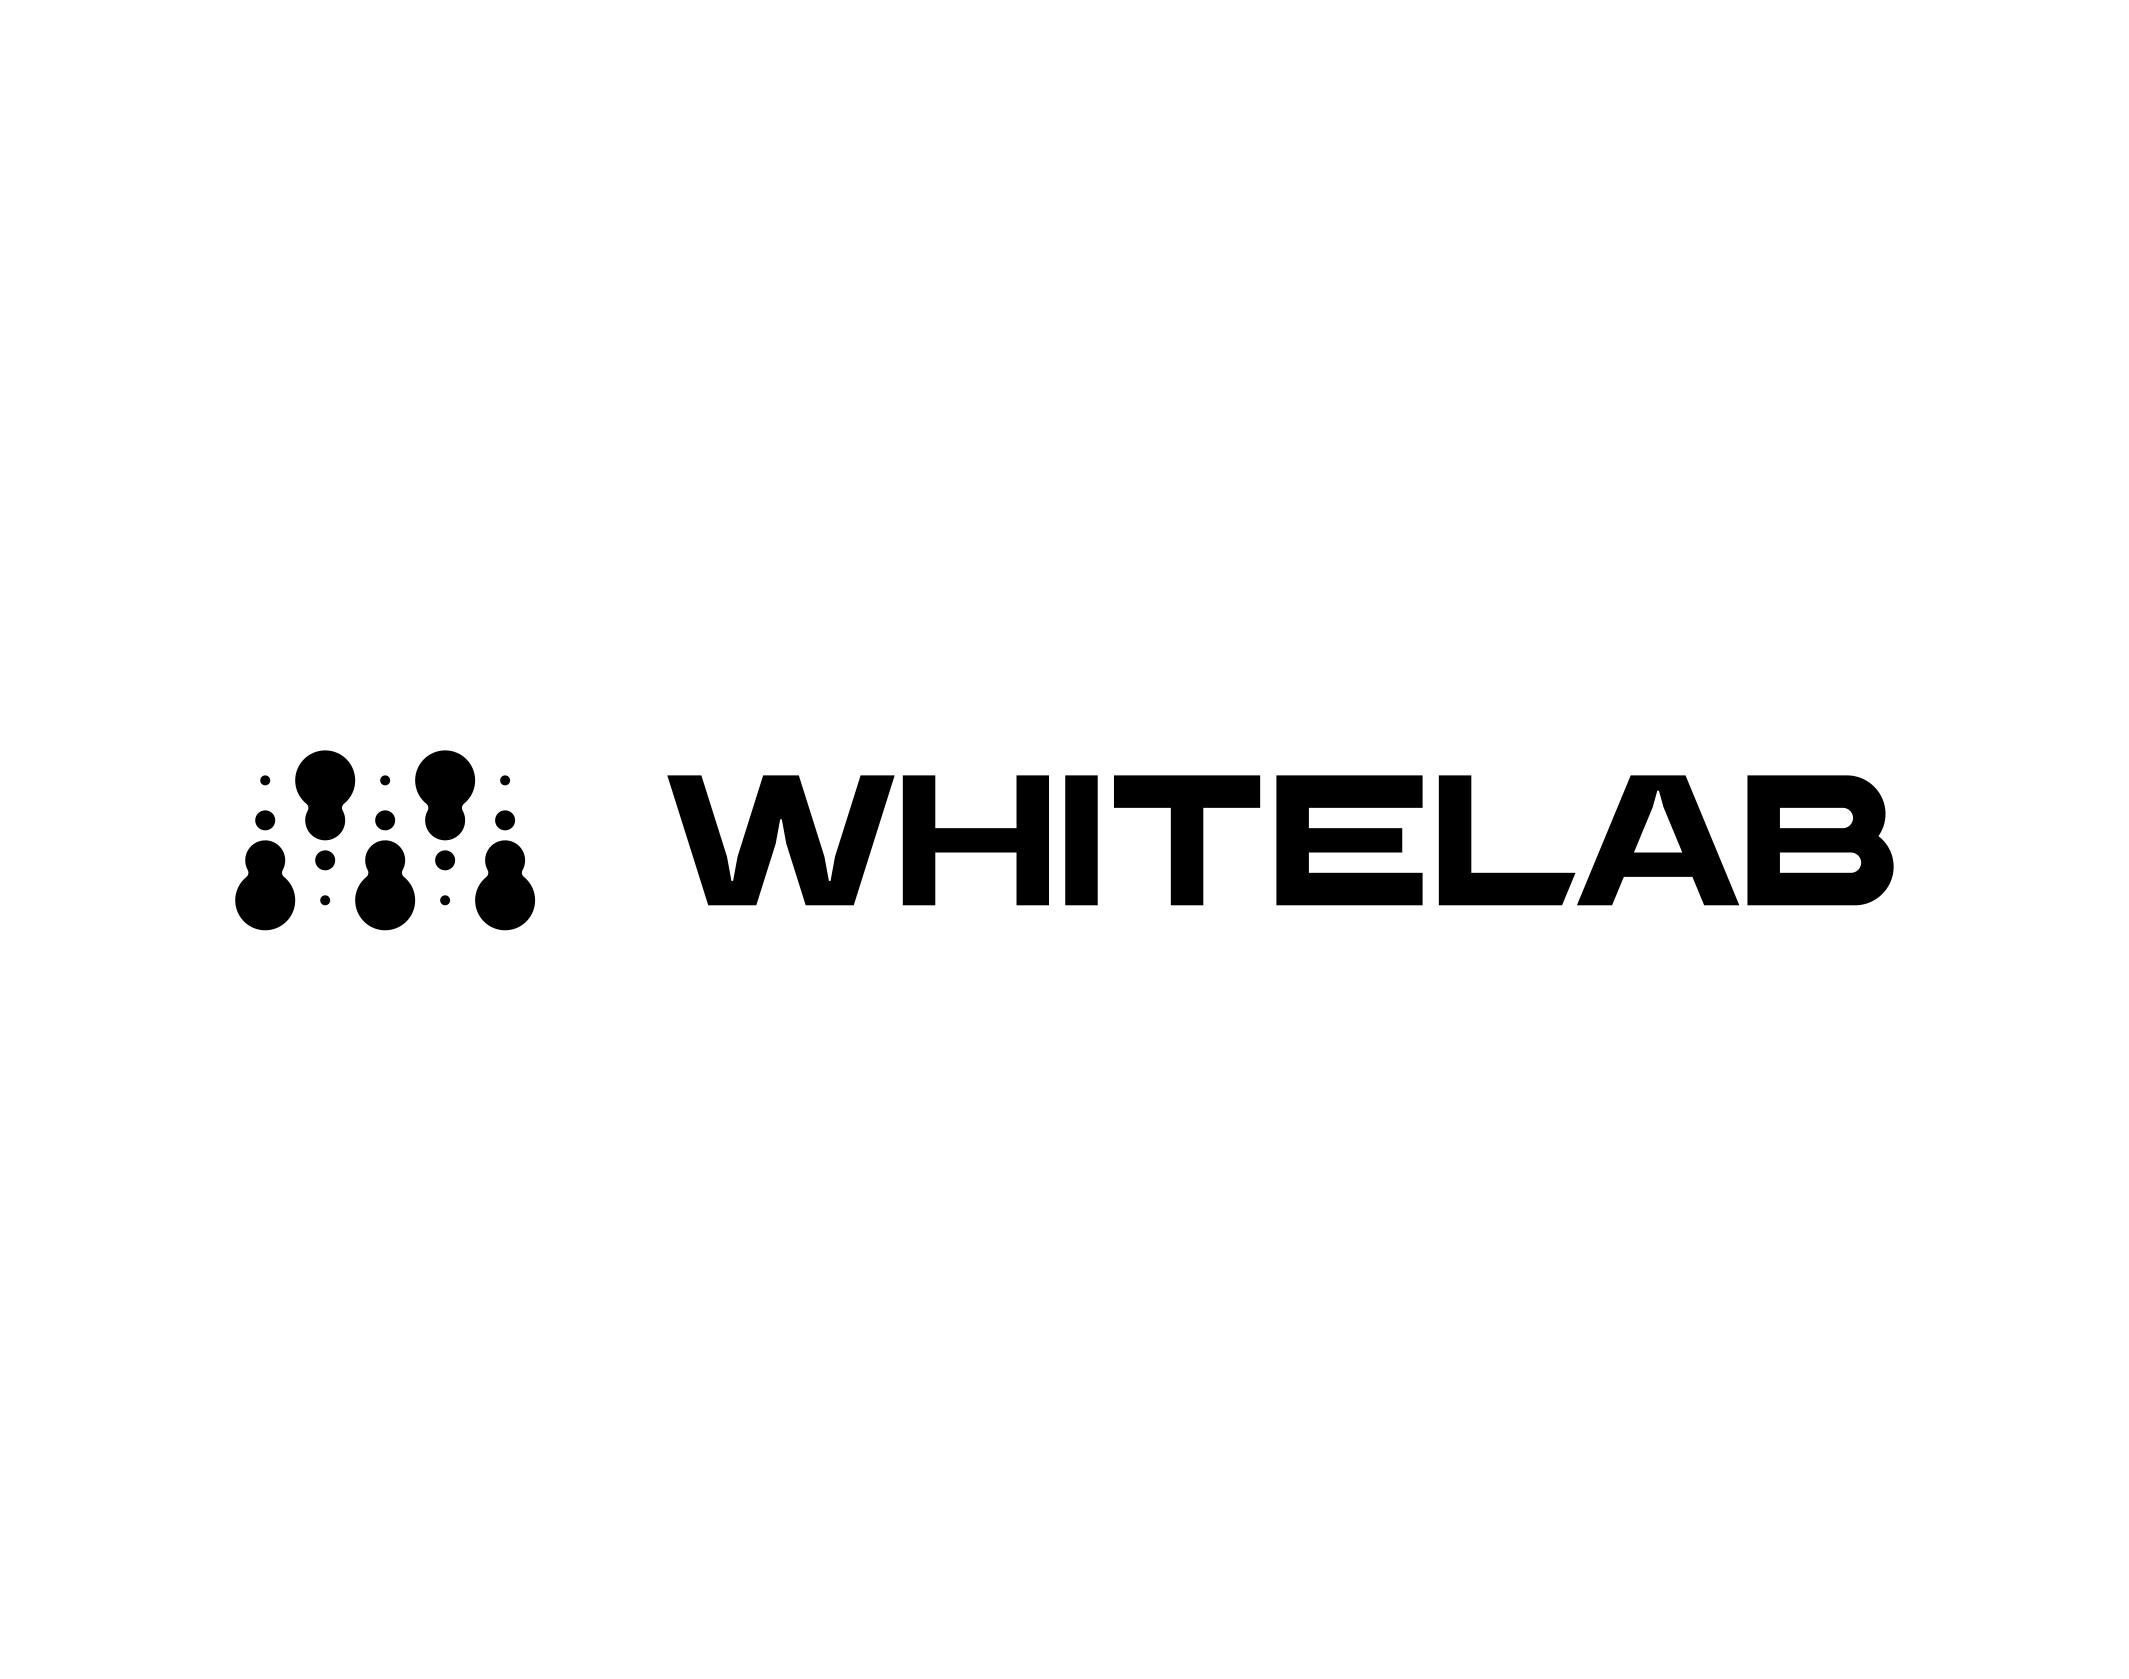 WhiteLab Genomics